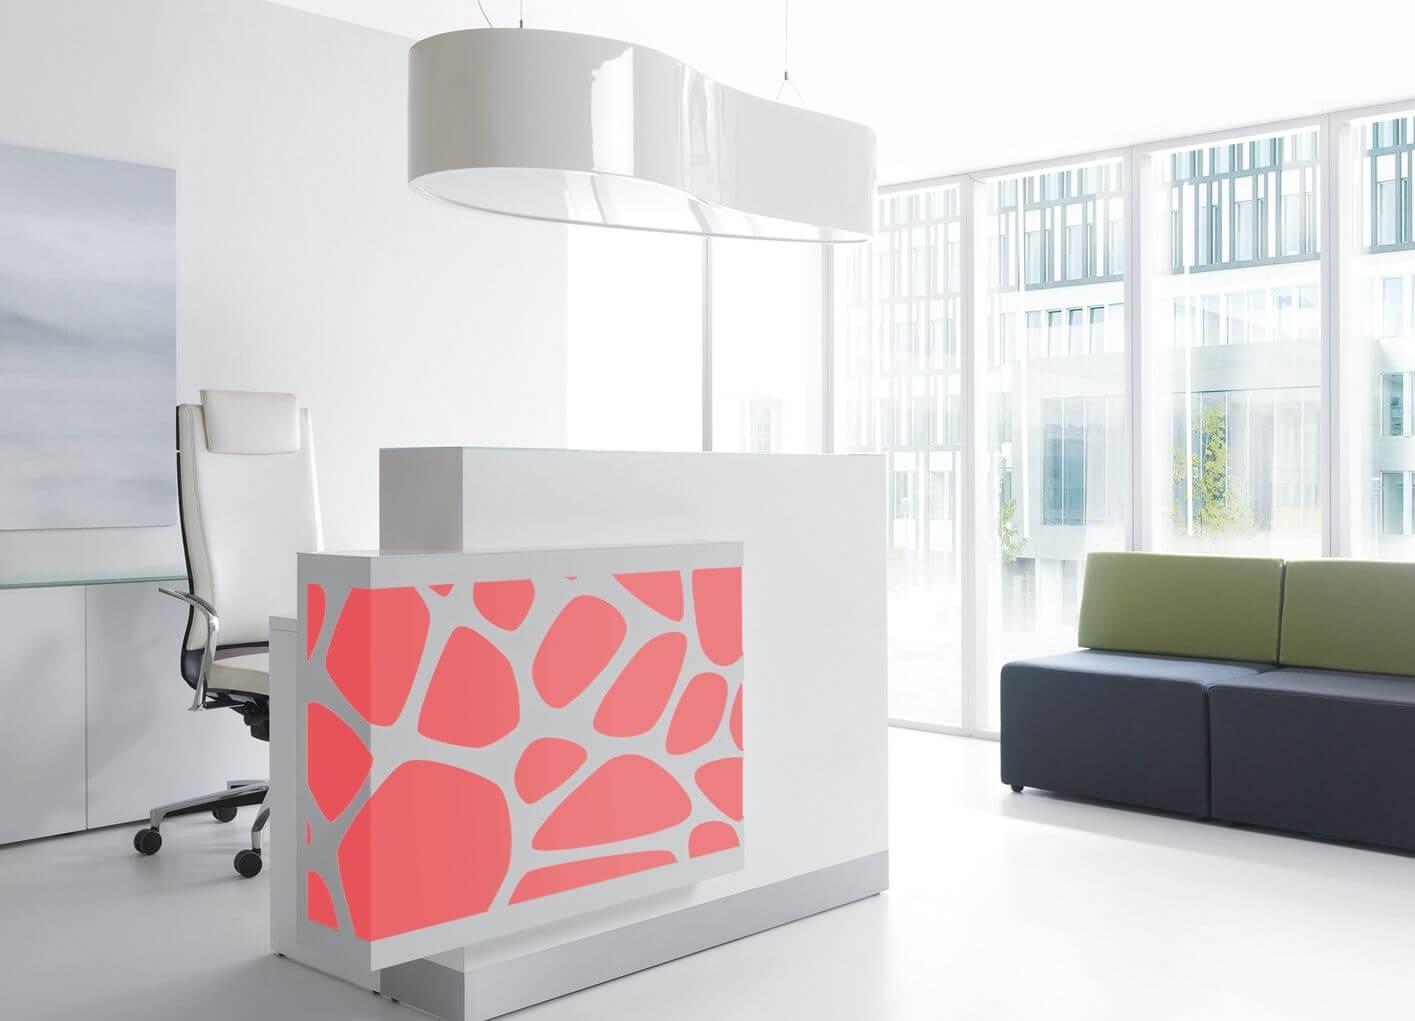 skitso lamps skitso nicoleta figure lamp handcrafted design artistic table lamps skitso. Black Bedroom Furniture Sets. Home Design Ideas